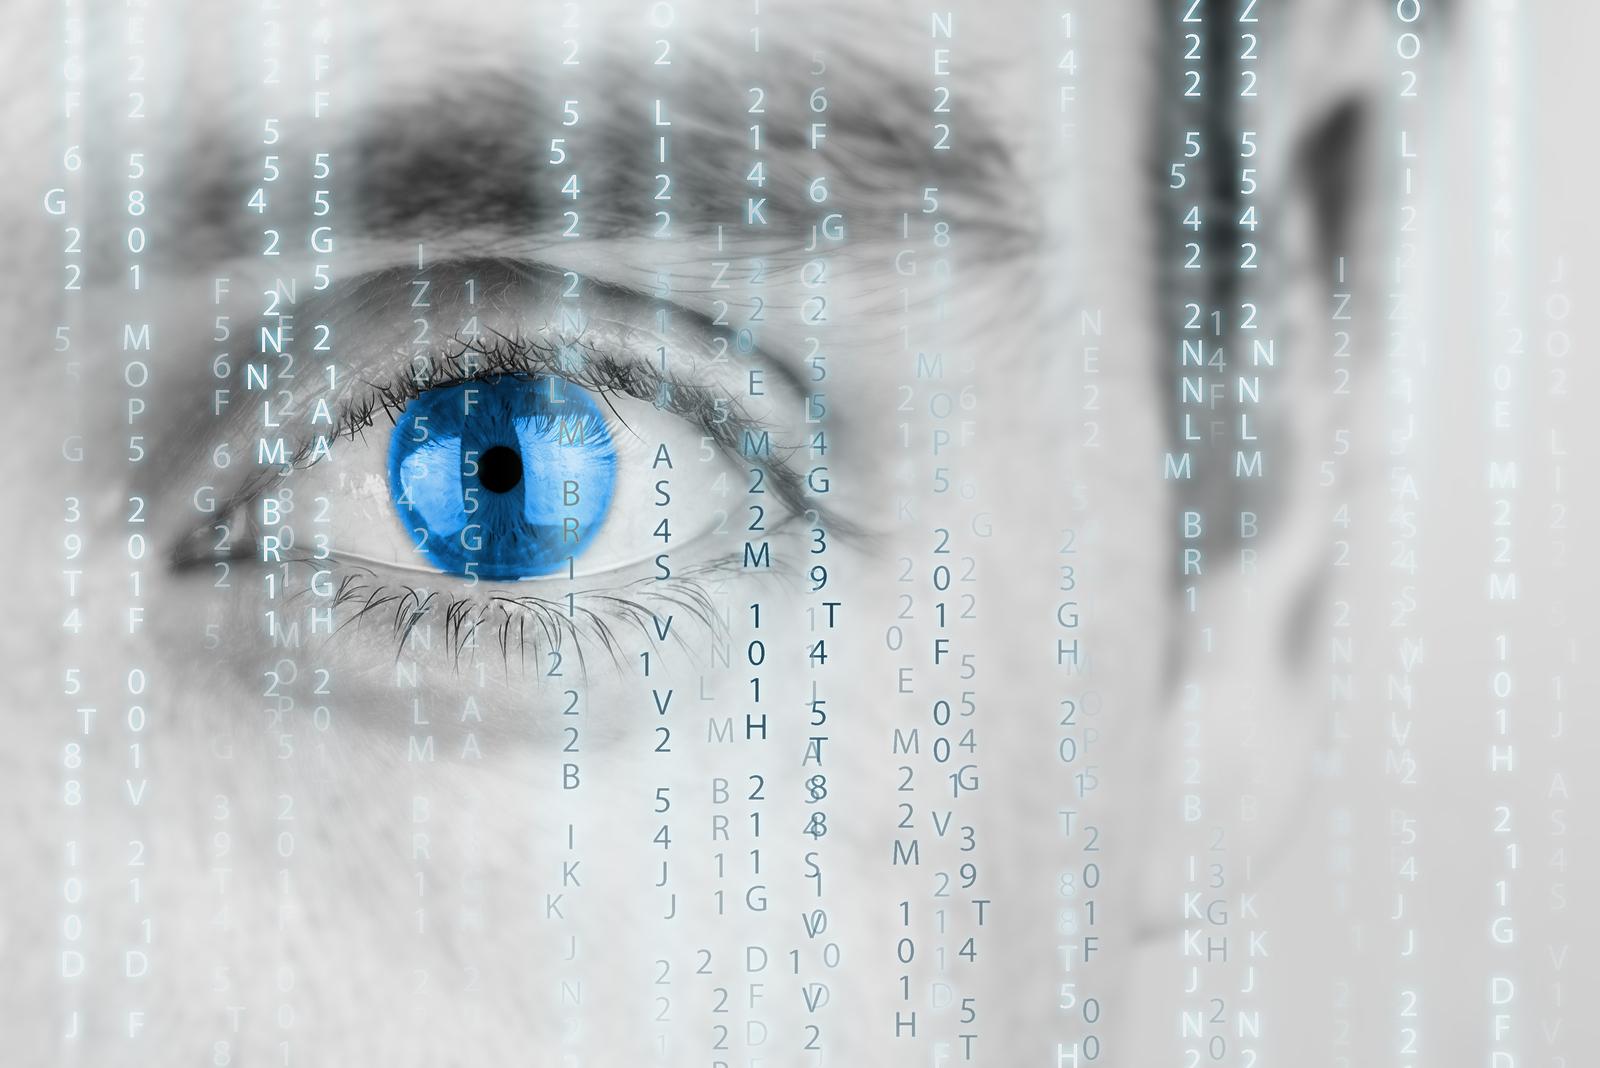 bigstock-Futuristic-Image-With-Matrix-T-66772102 Welcome To The Post-Digital Marketing World